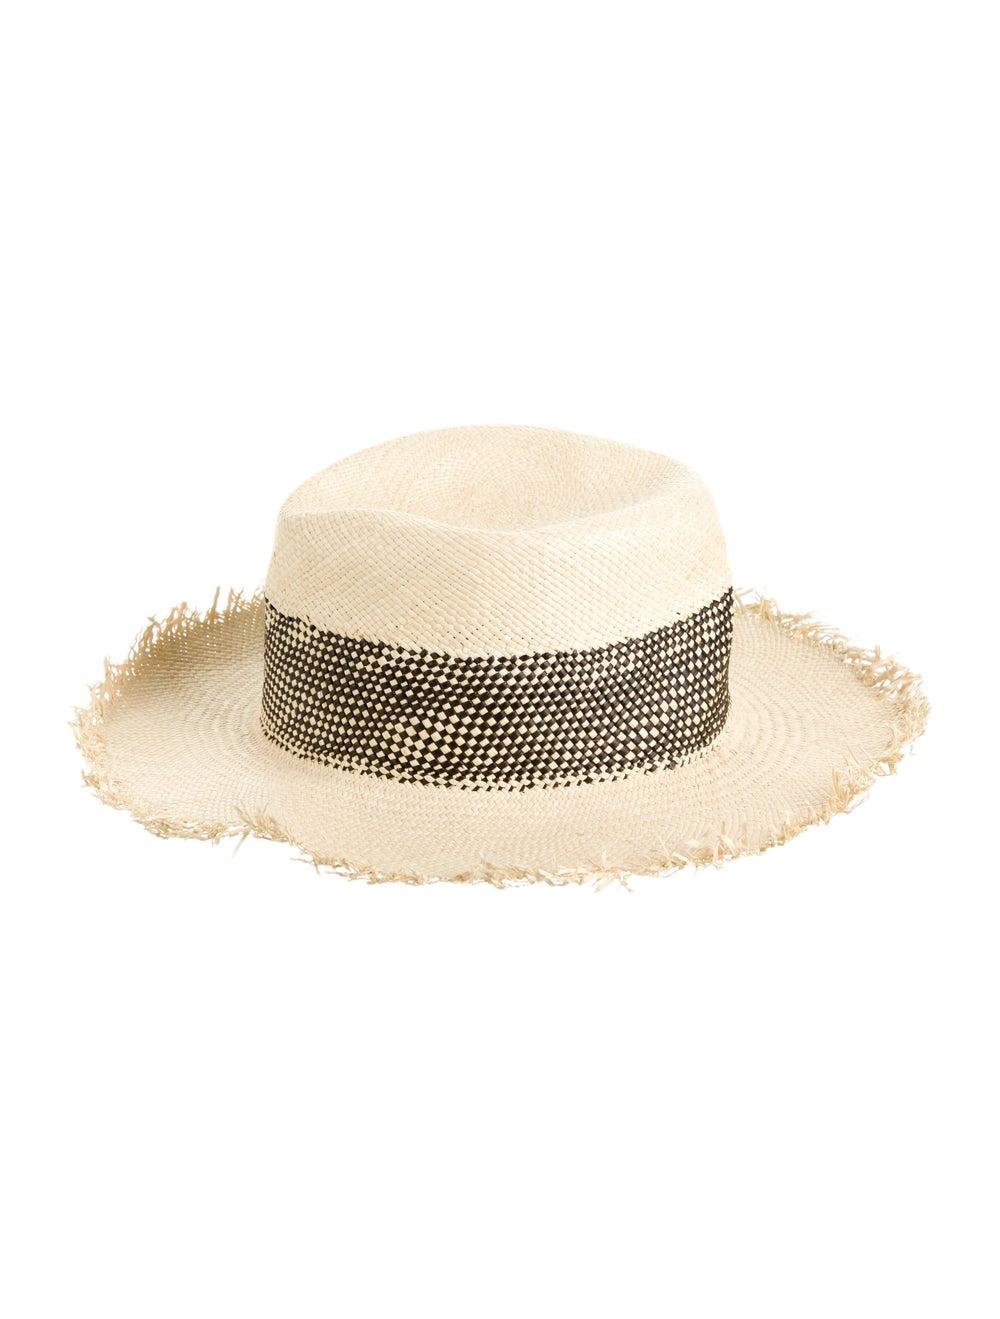 Rag & Bone Straw Wide Brim Hat - image 1